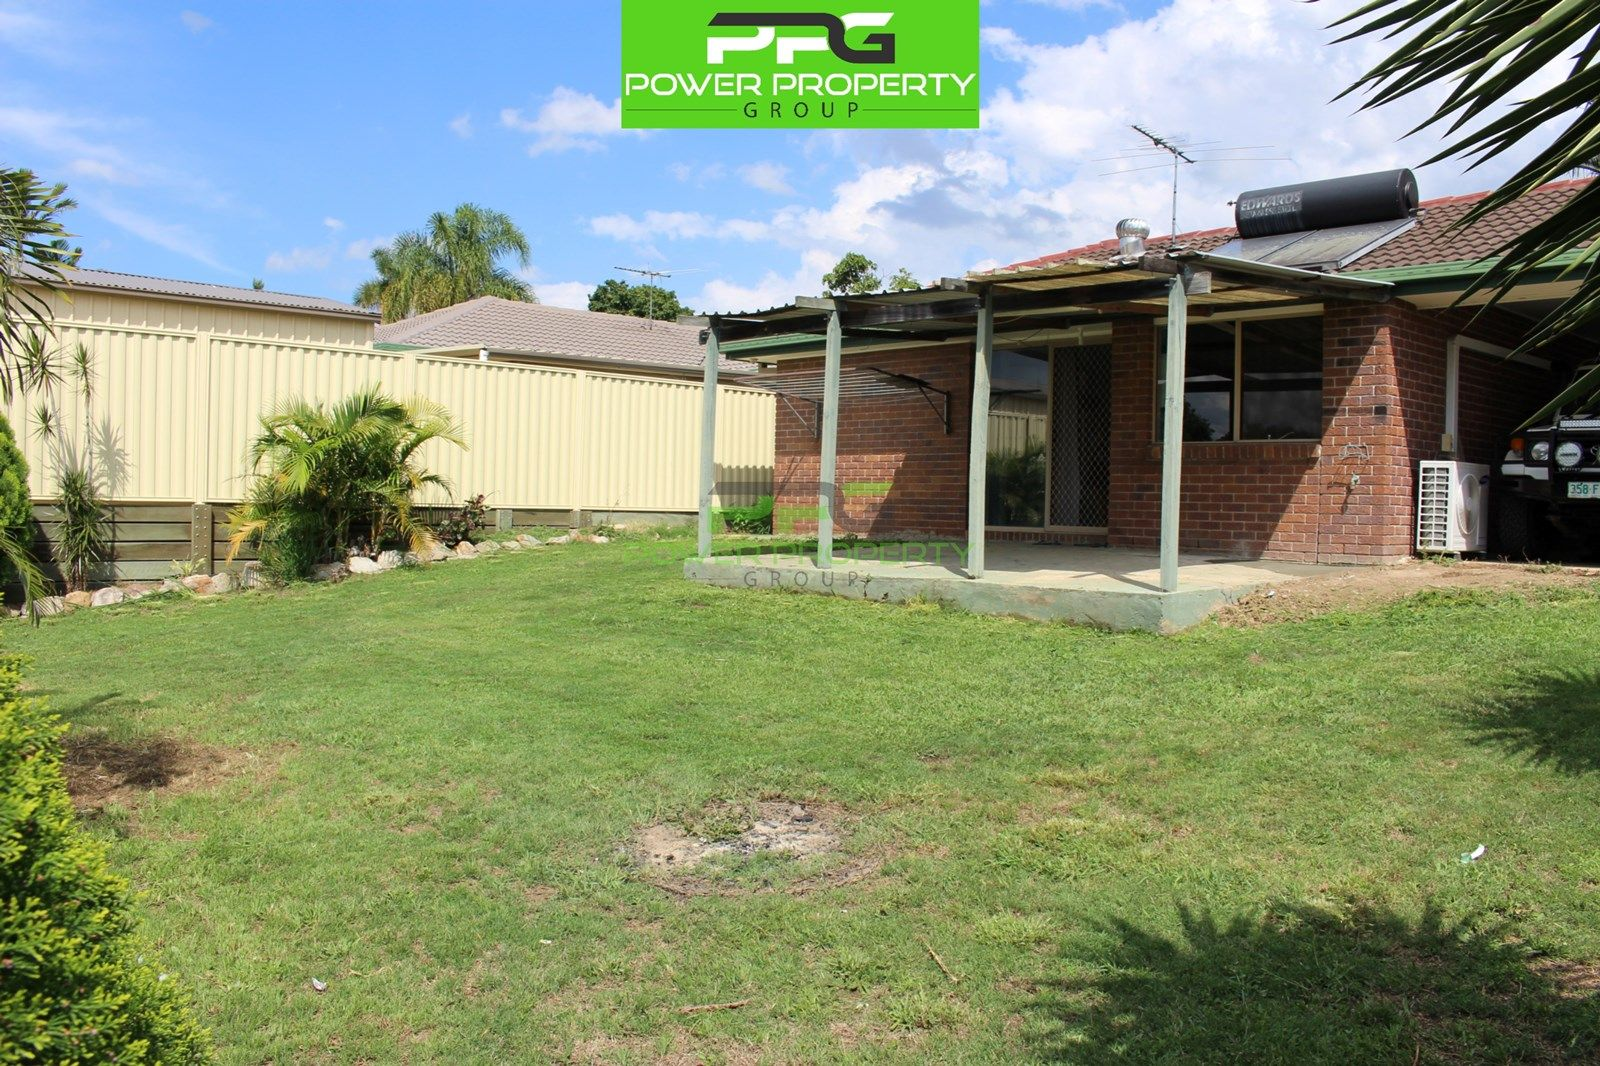 17 Diamantina St, Hillcrest QLD 4118, Image 10